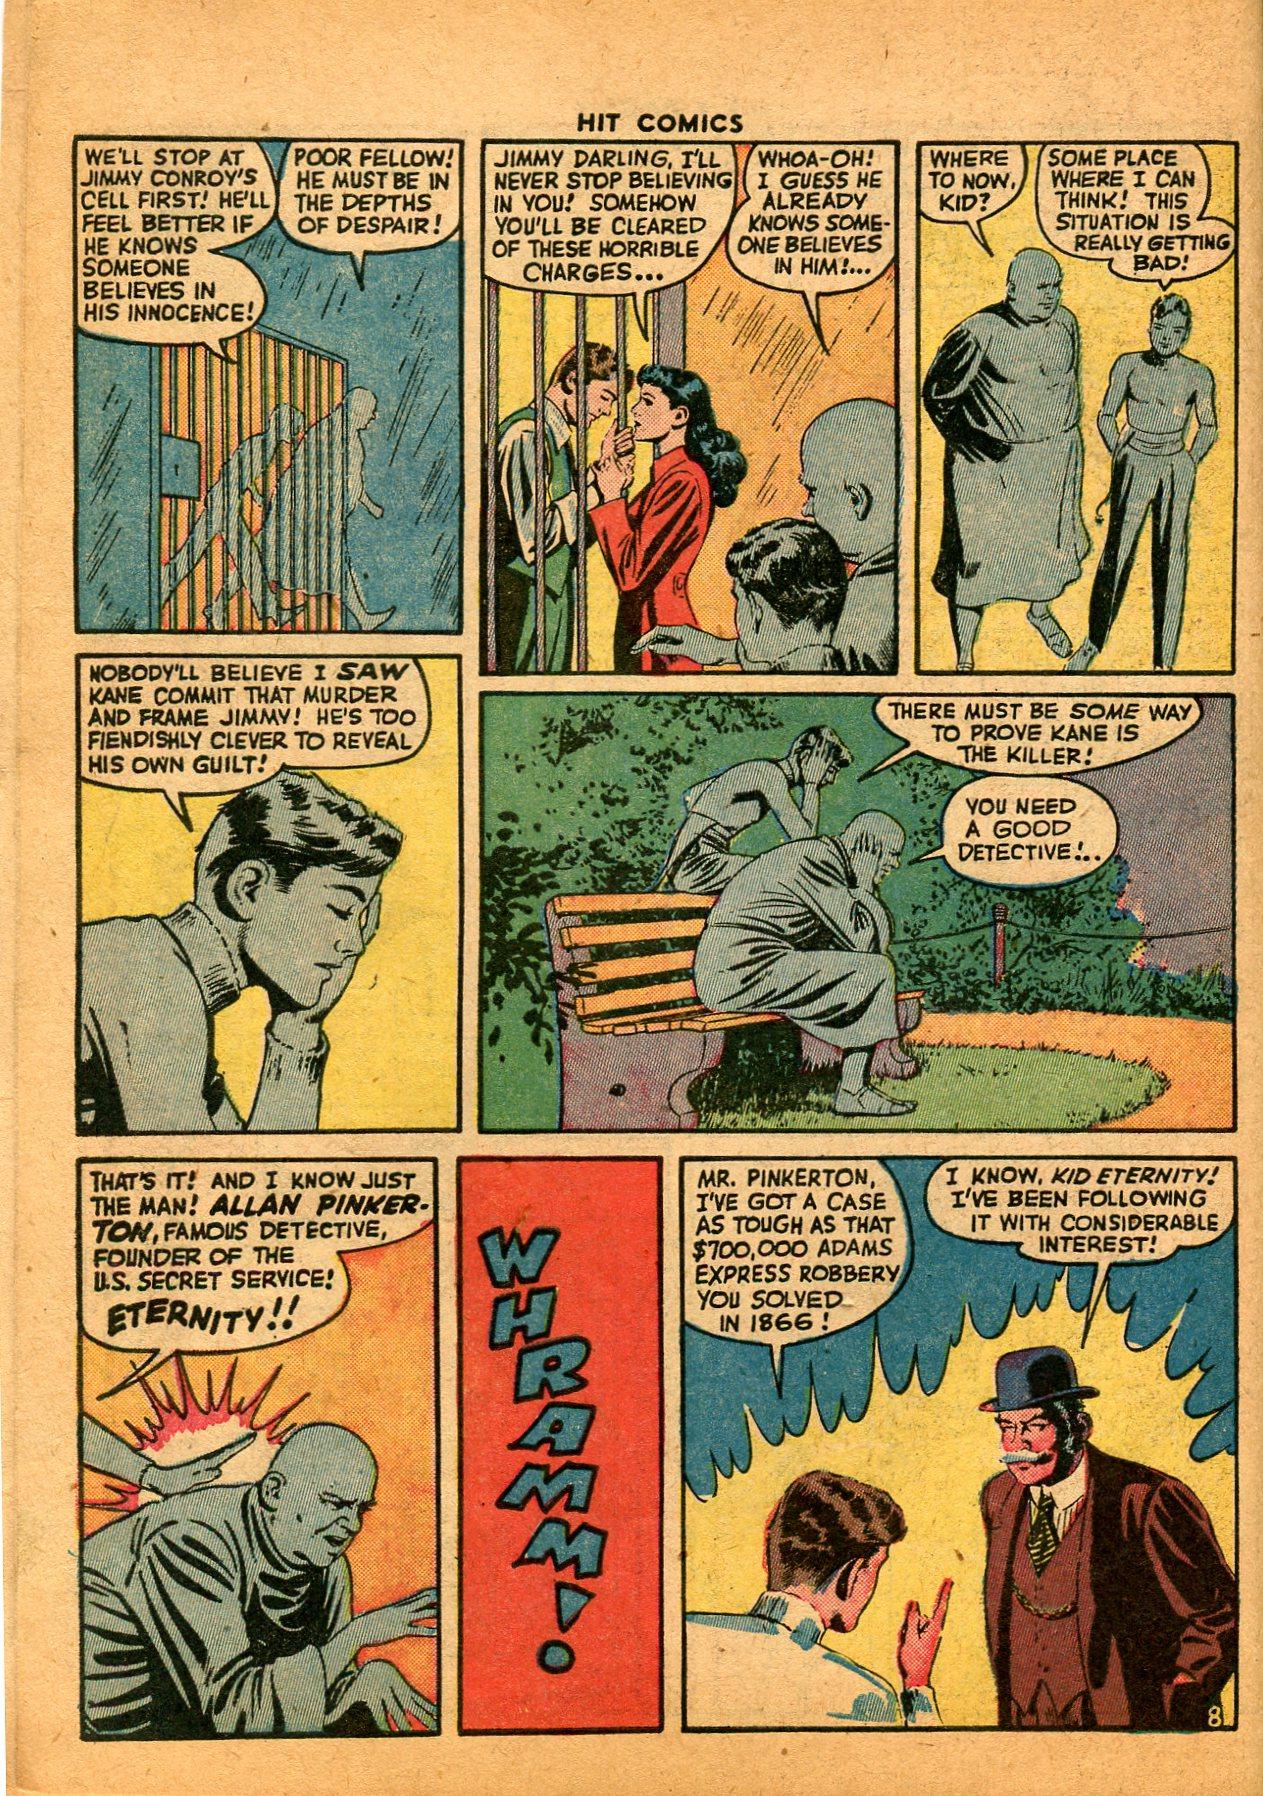 Read online Hit Comics comic -  Issue #35 - 10